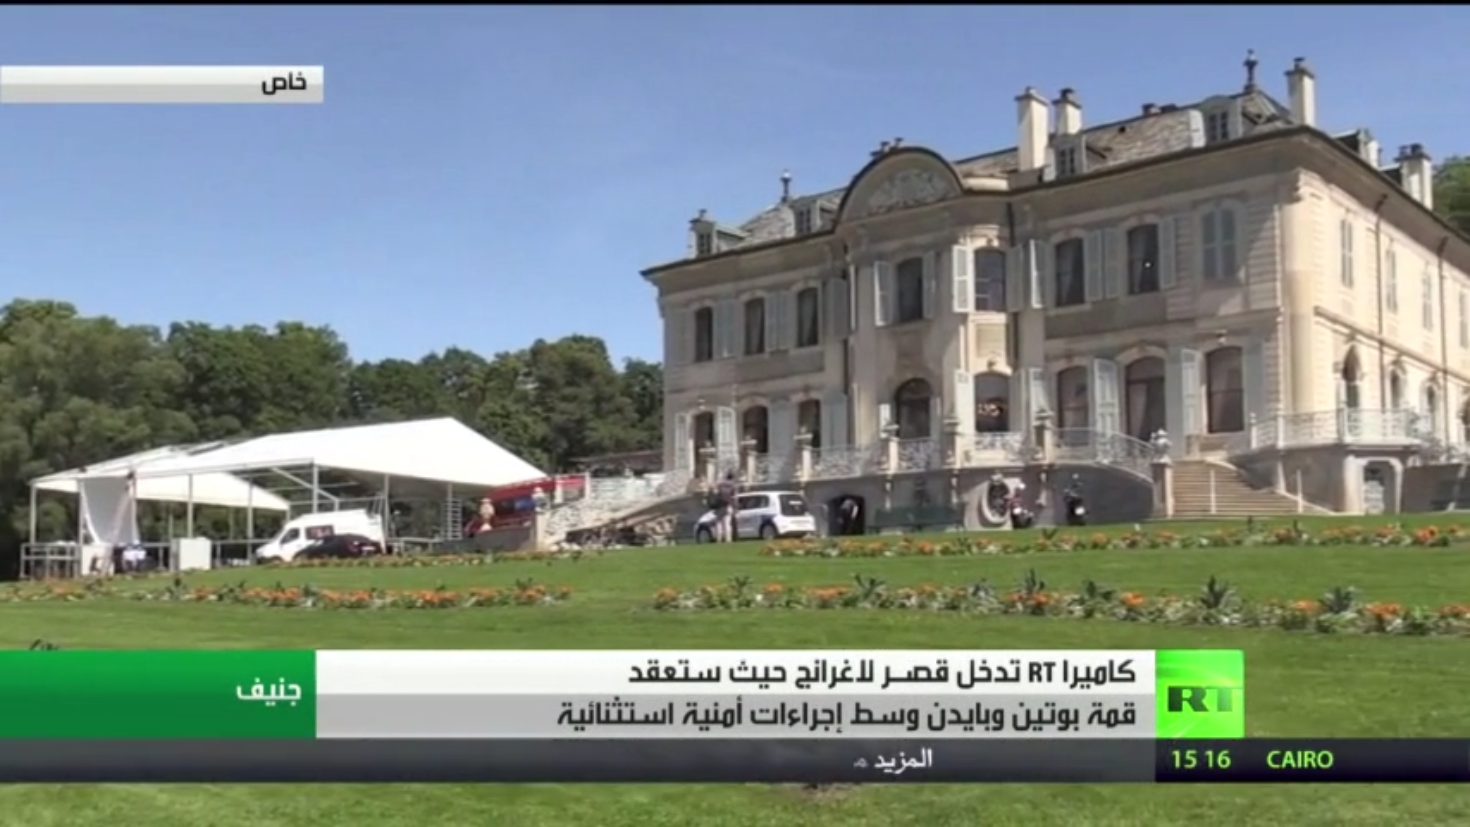 RT في قصر لاغرانج حيث ستعقد قمة بوتين وبايدن